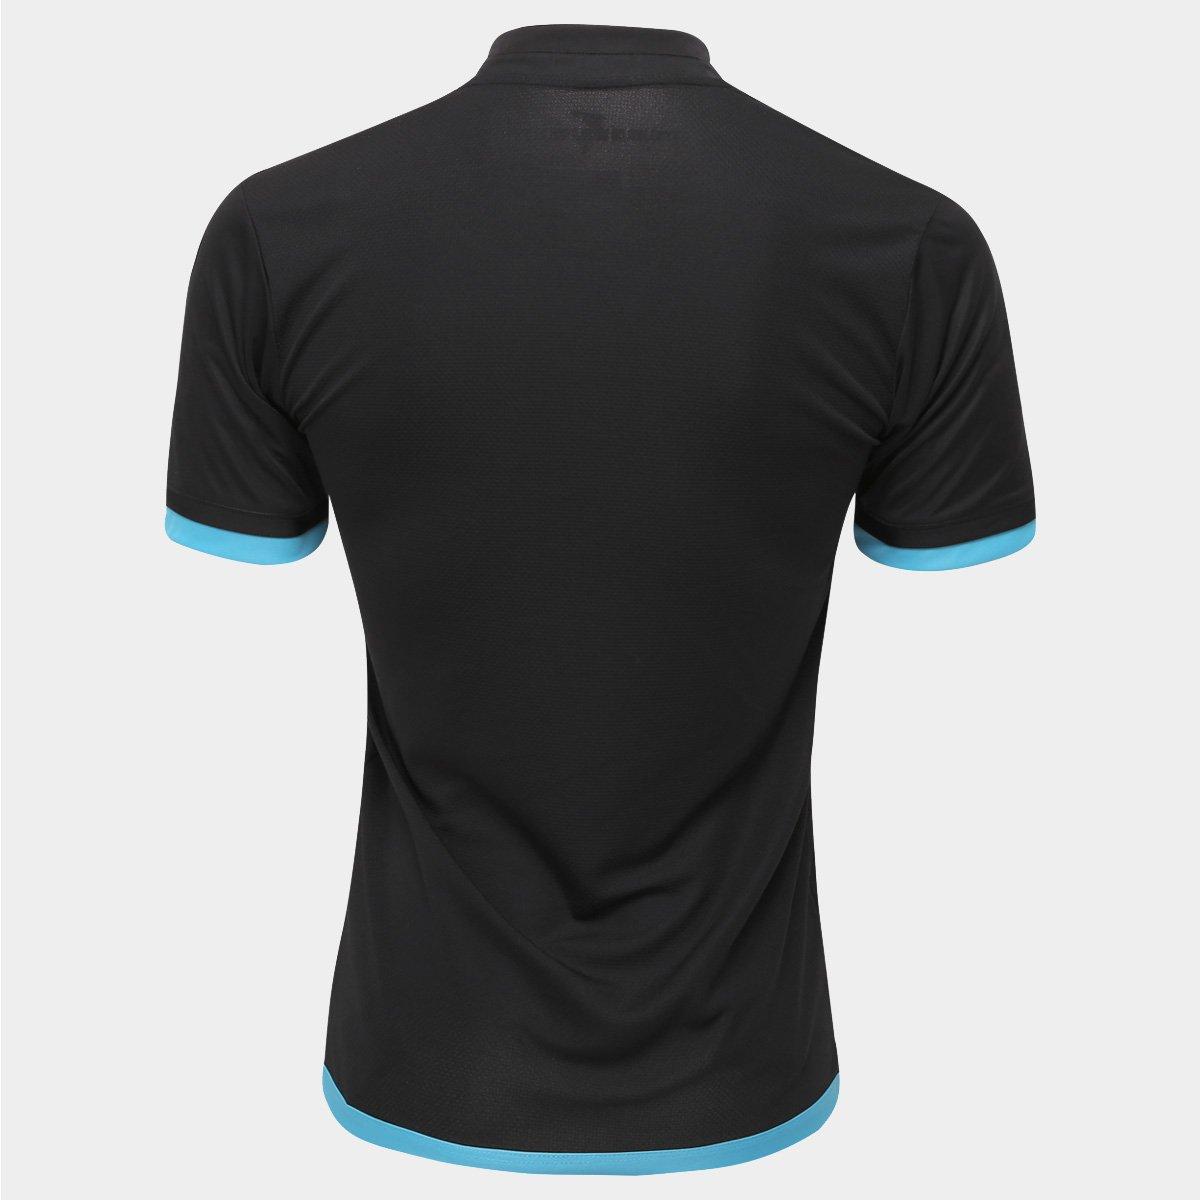 Camisa Santos Goleiro I 2016 s nº Torcedor Kappa Masculina - Compre ... 19ce5a5c6811d